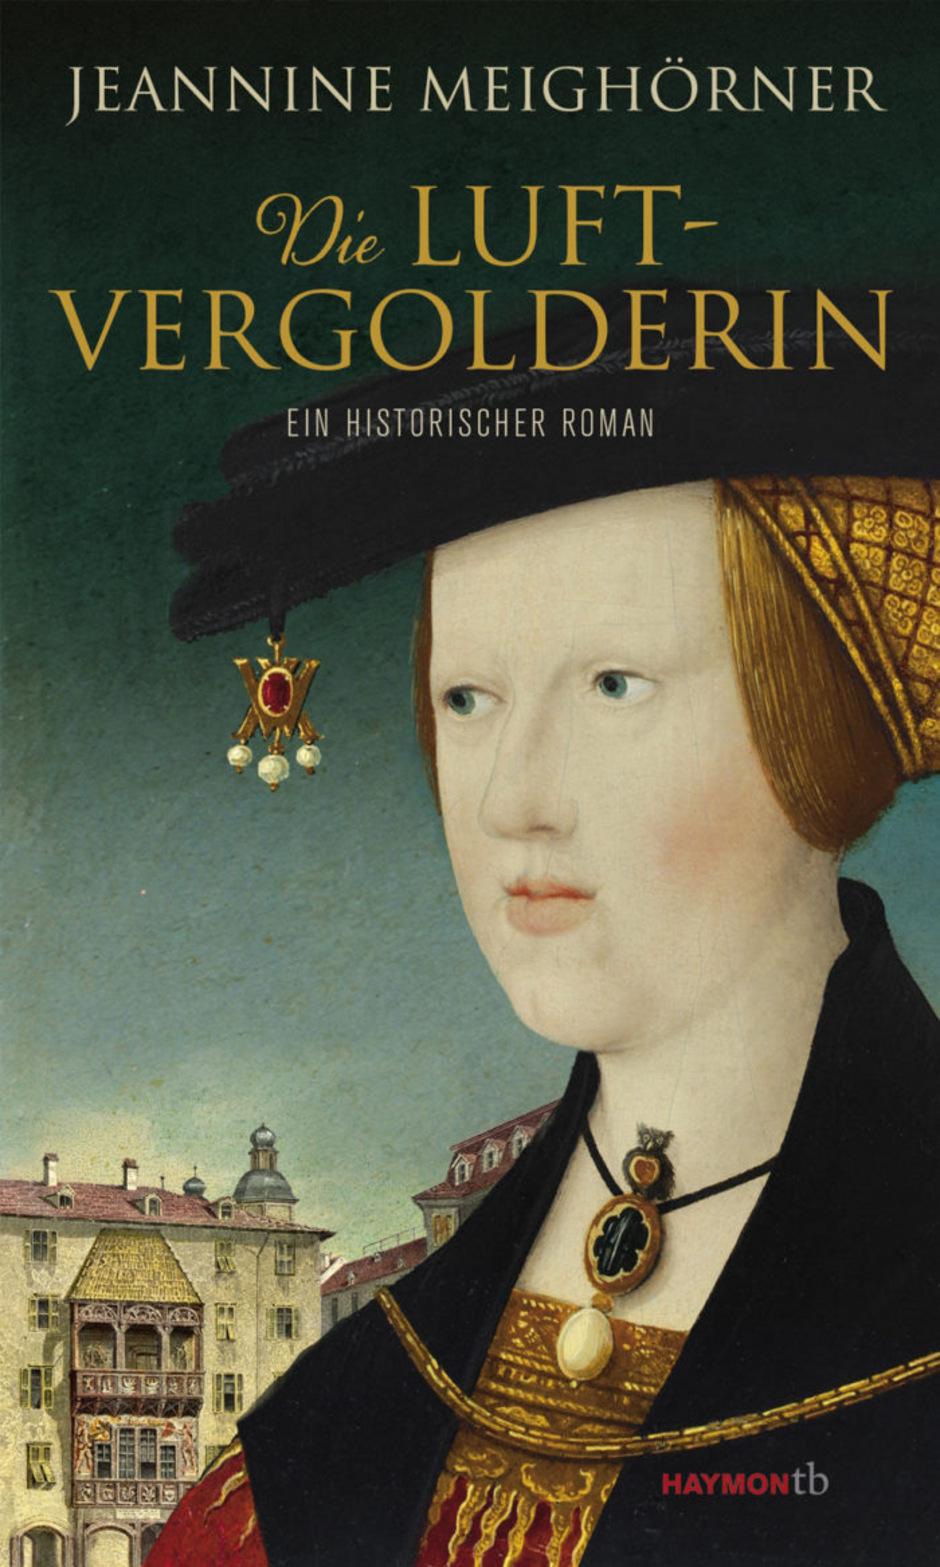 Roman Jeannine Meighörner: Die Luftvergolderin. Haymon, 309 S.Lesung. Heute in der Tyrolia, Innsbruck. Beginn: 19.30 Uhr.